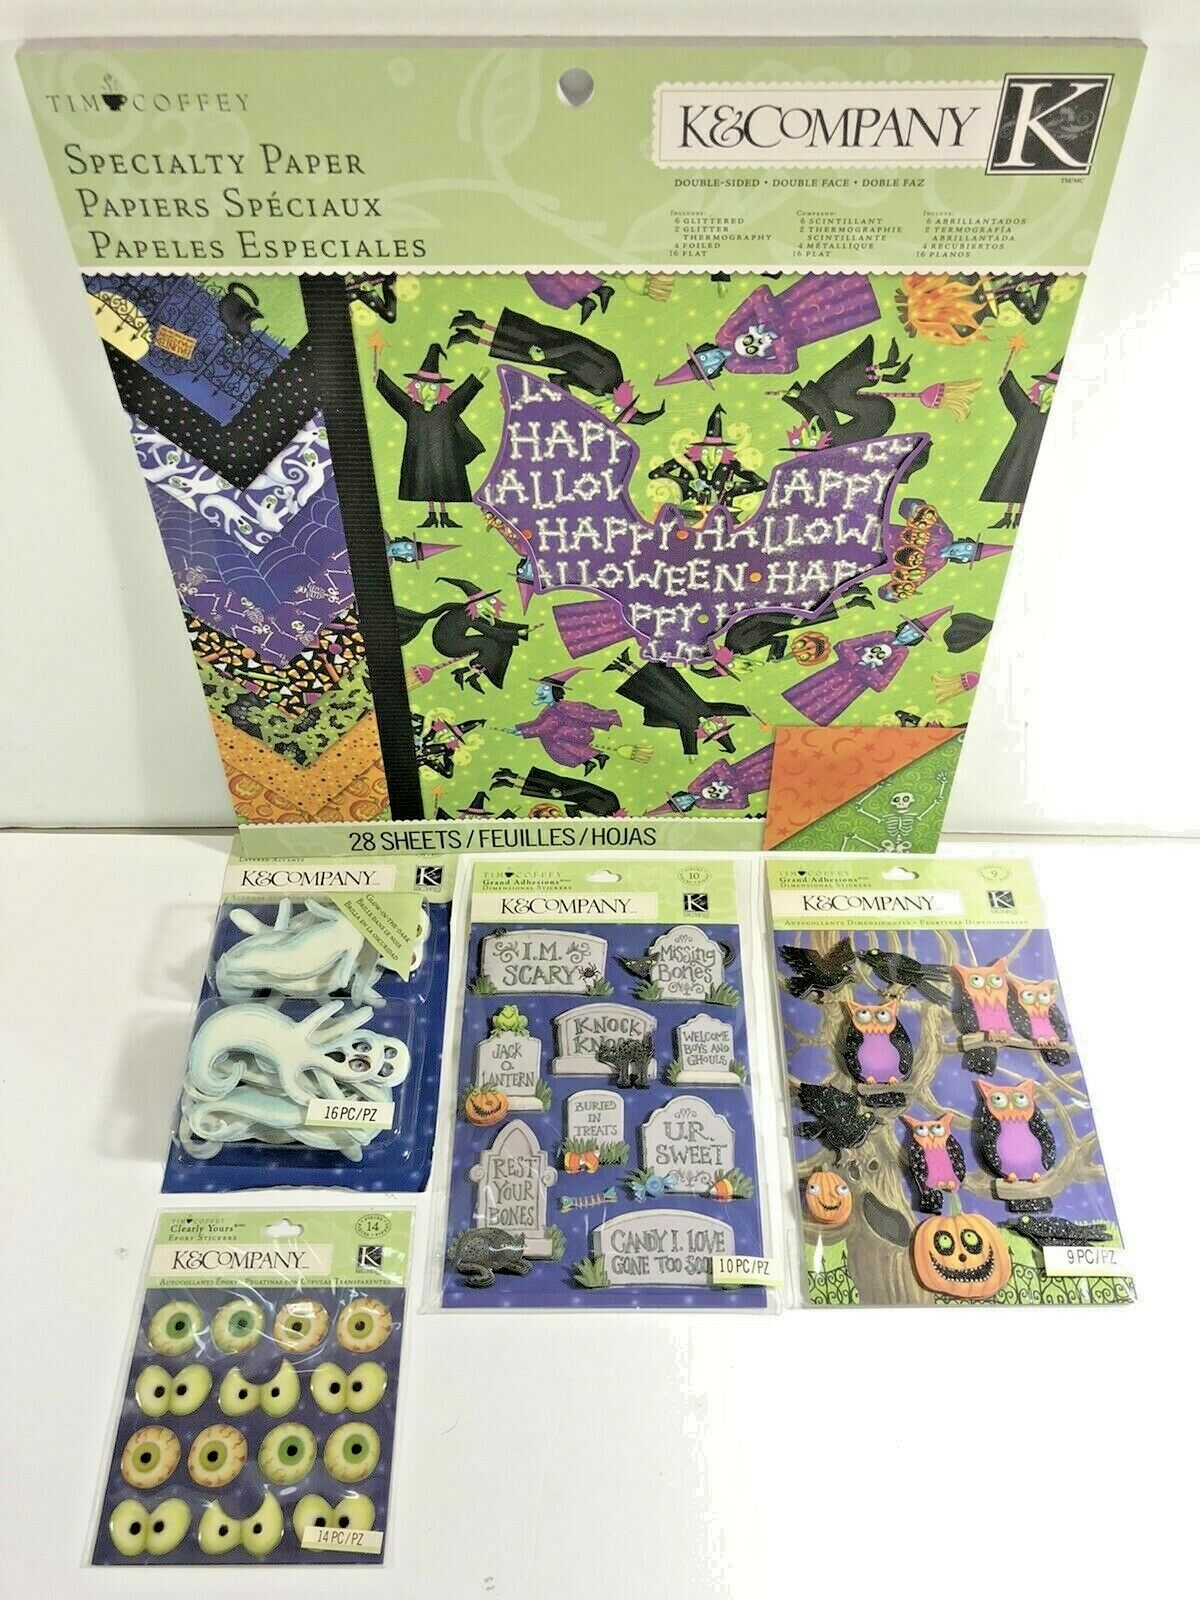 K Company Tim Coffey Halloween LOT Dimensional Stickers Paper Pad Owl NEW HTF - $34.95